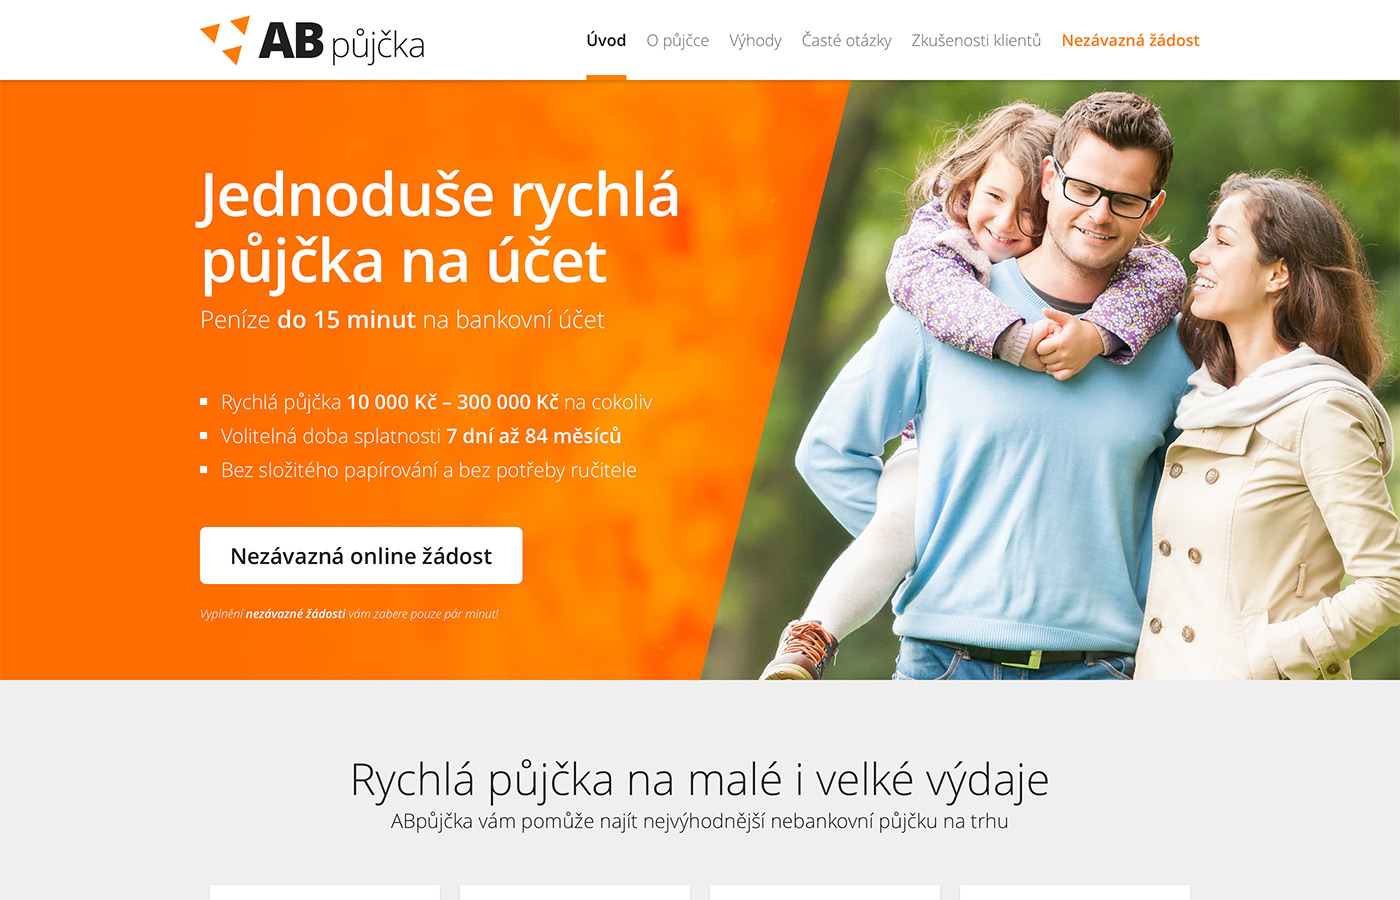 Webové stránky https://www.abpujcka.cz